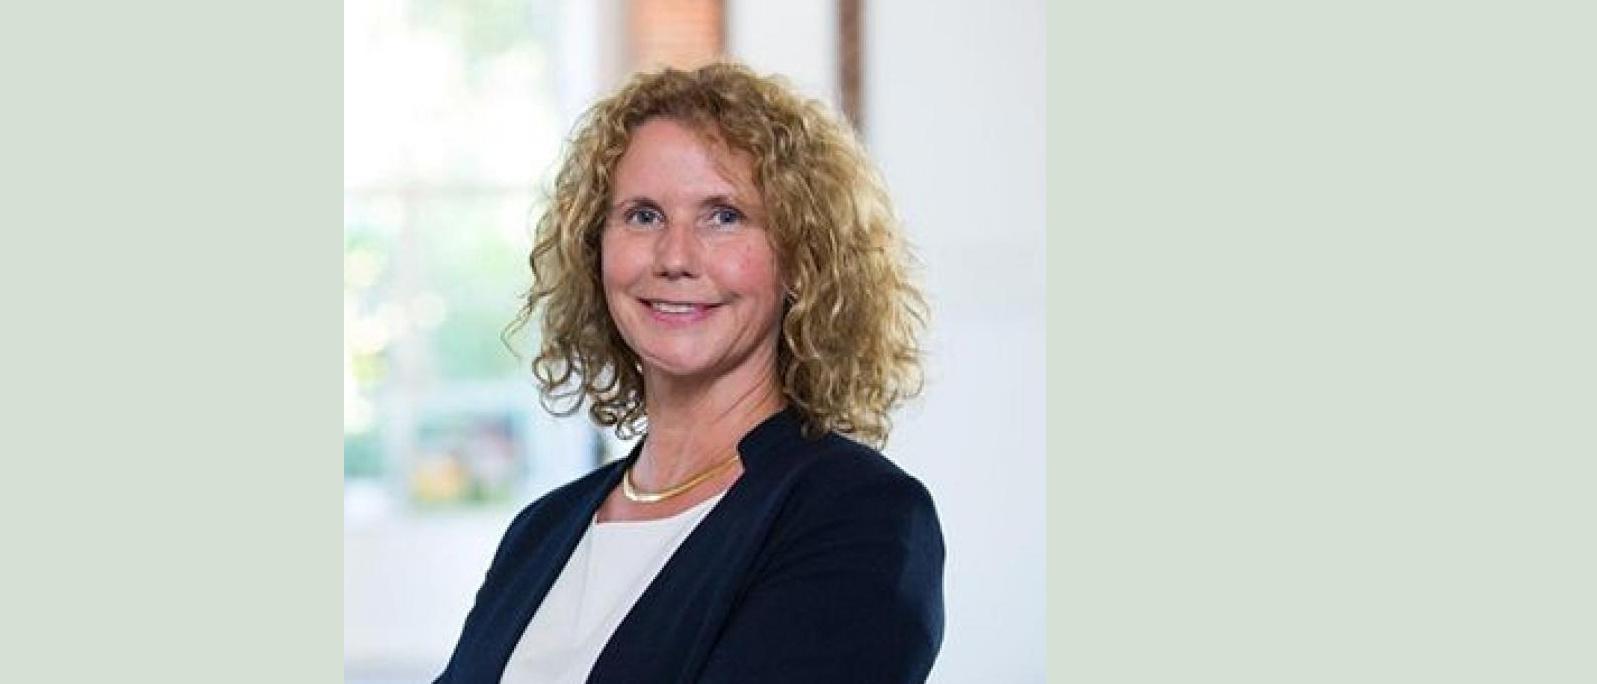 Danielle Jacobs (Beltug), DN